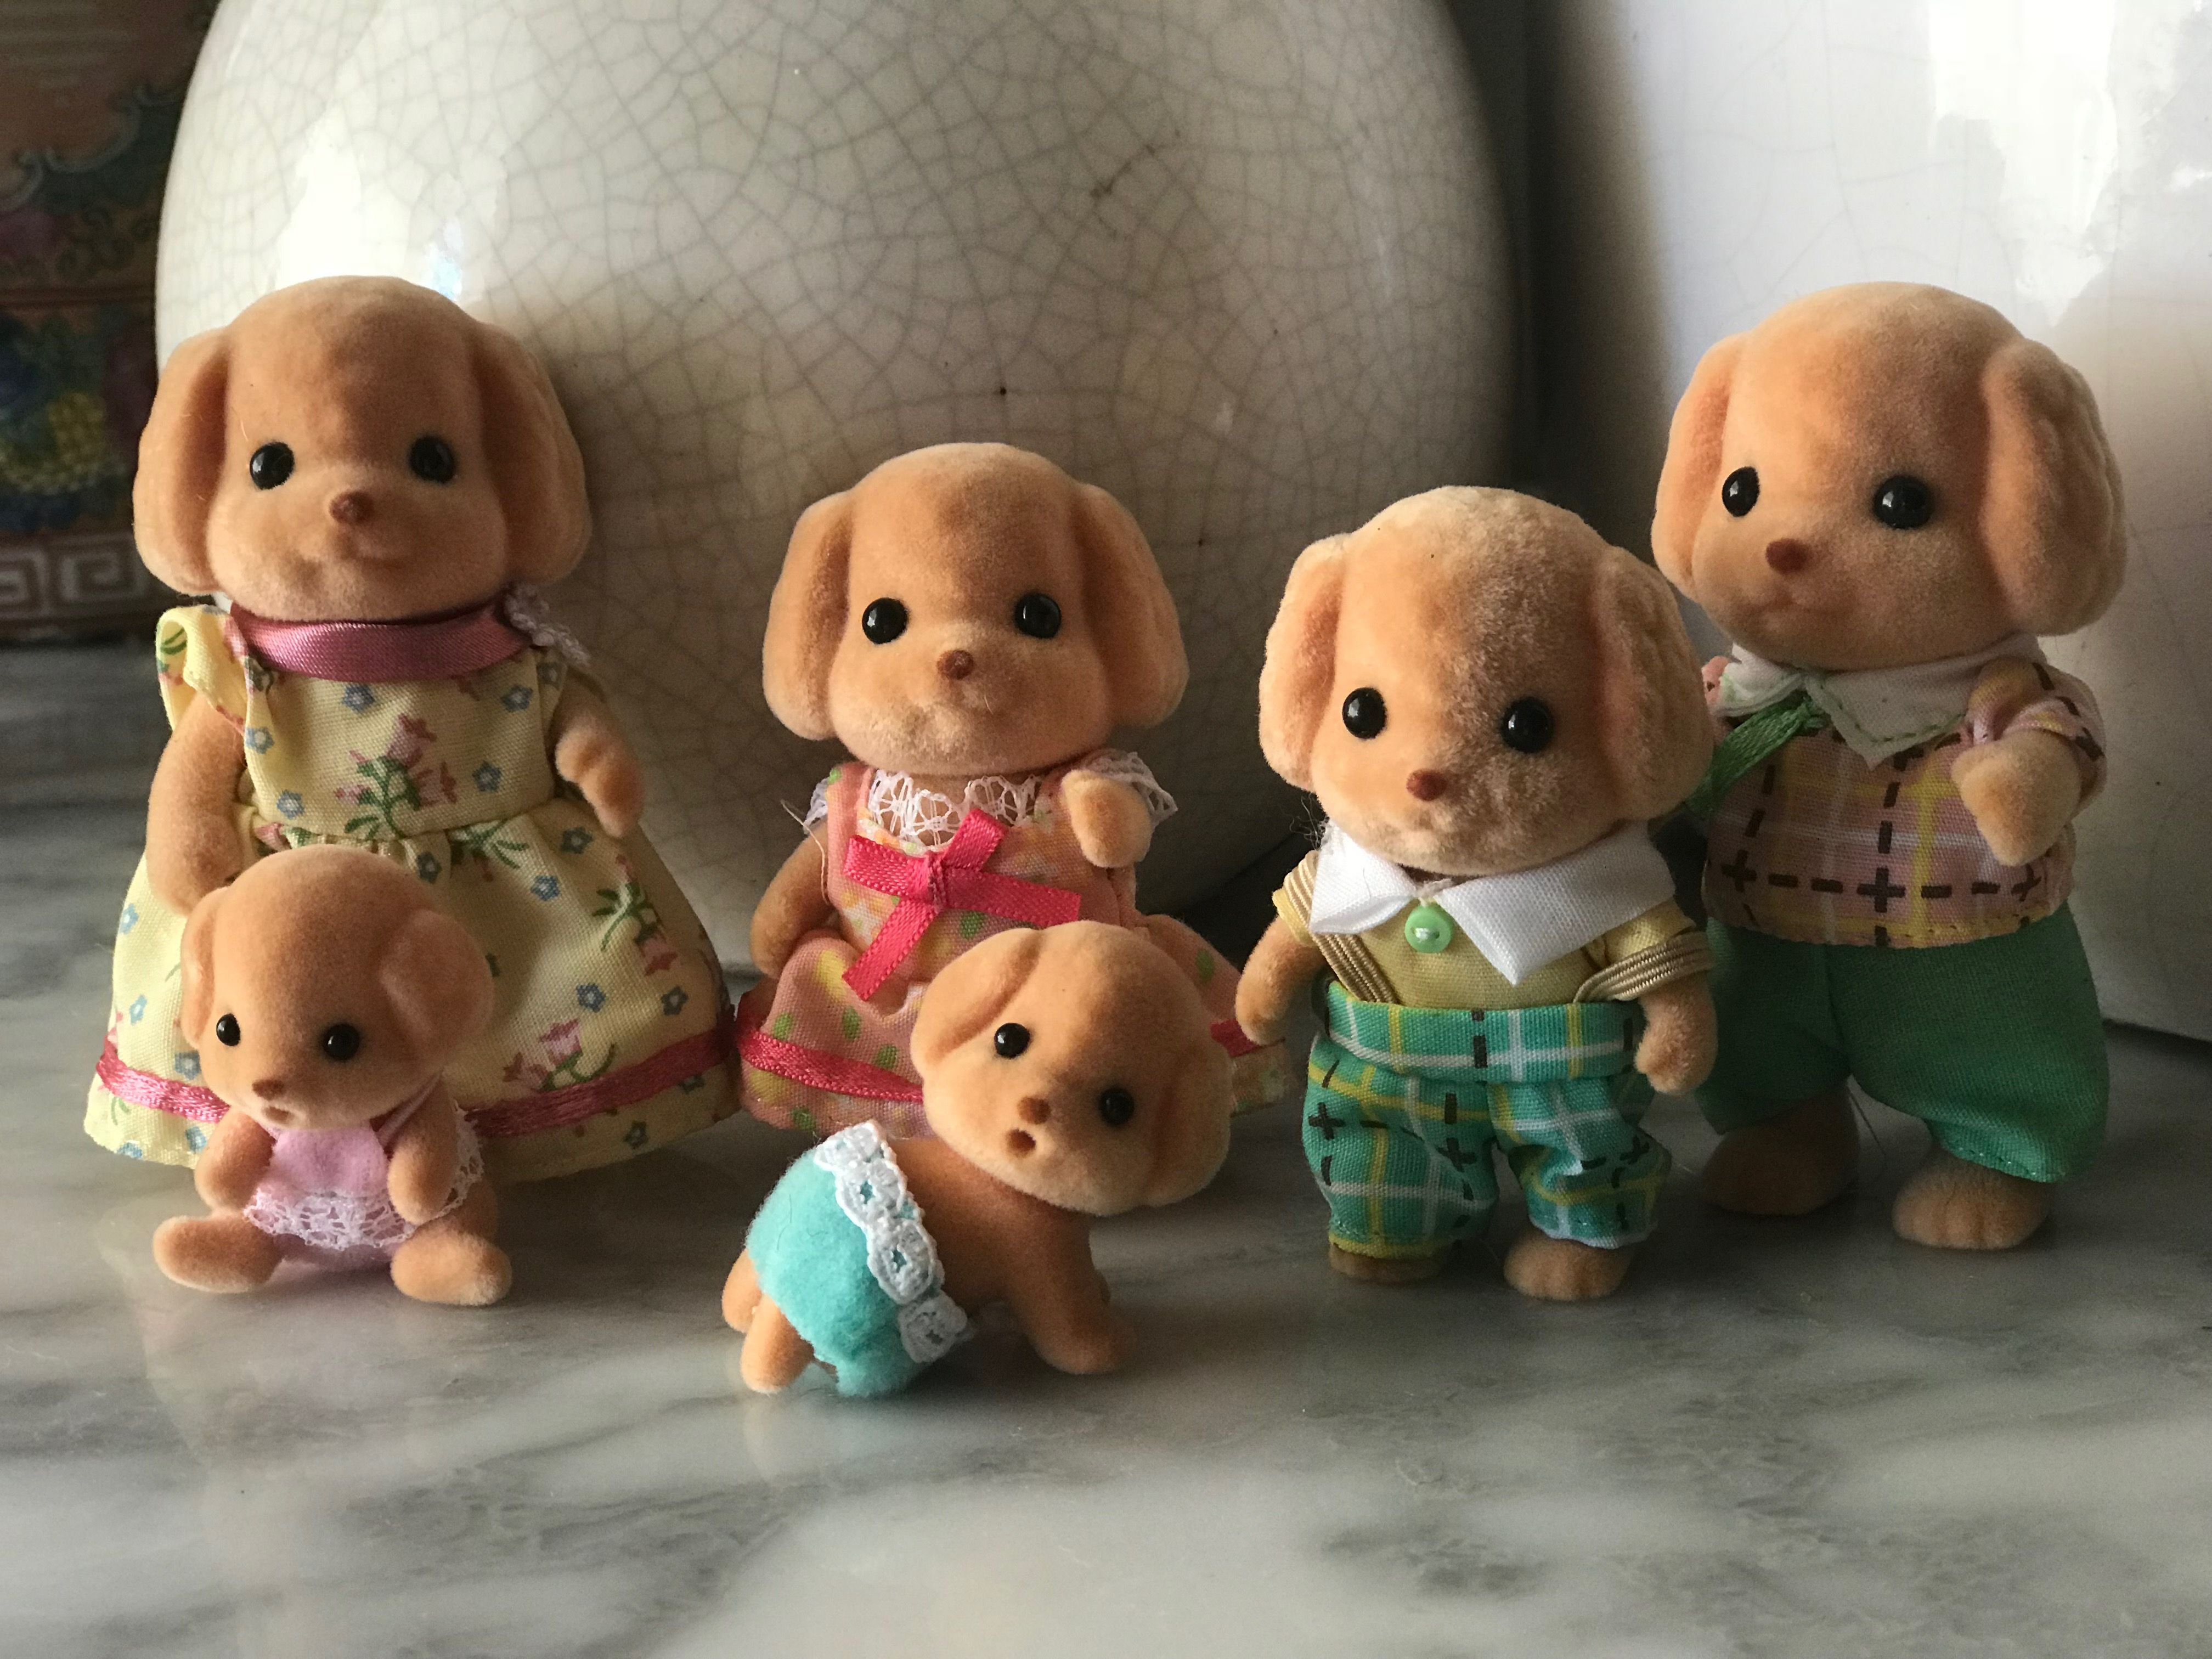 Cakebread Toy Poodles